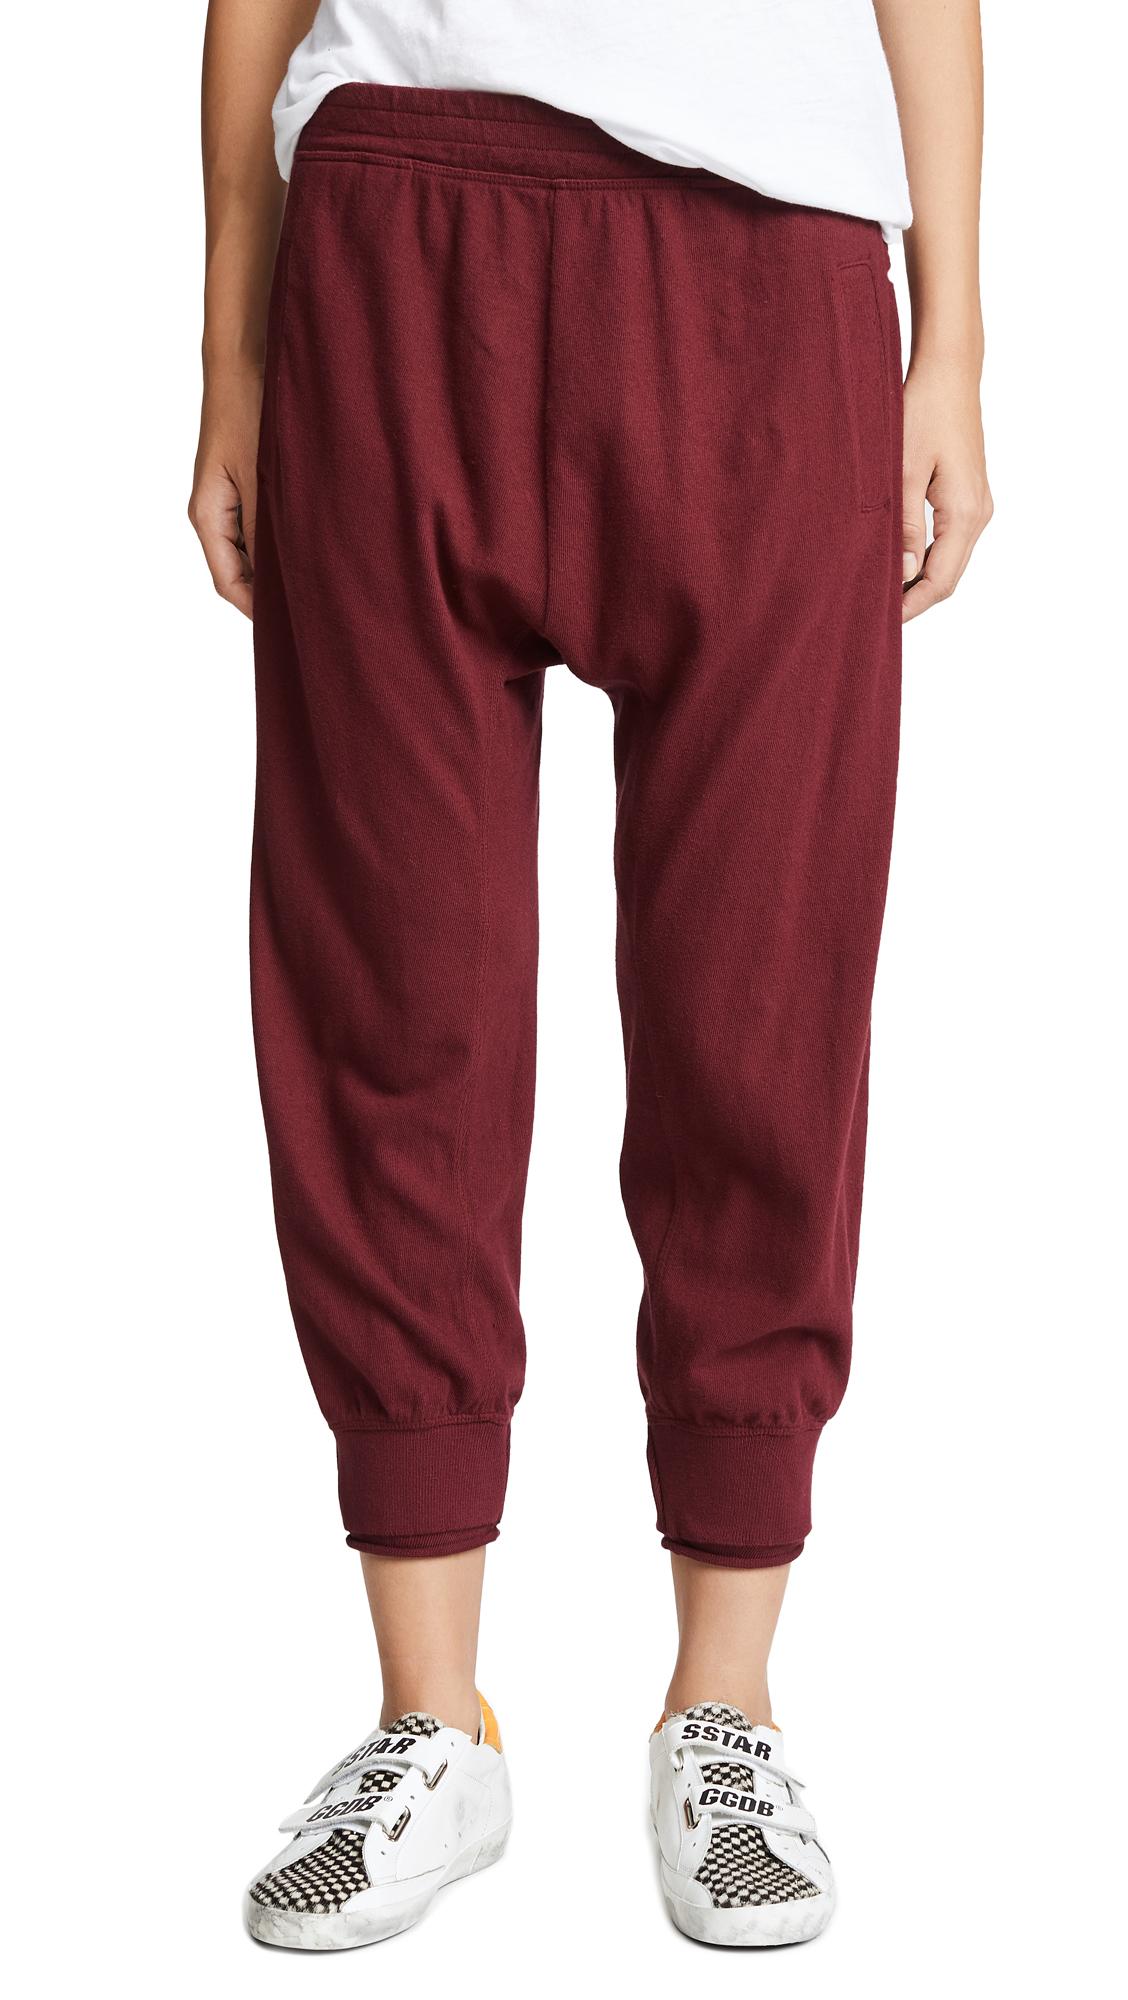 WILT Shrunken Sweatpants W Rolled Rib Cuff in Garnet